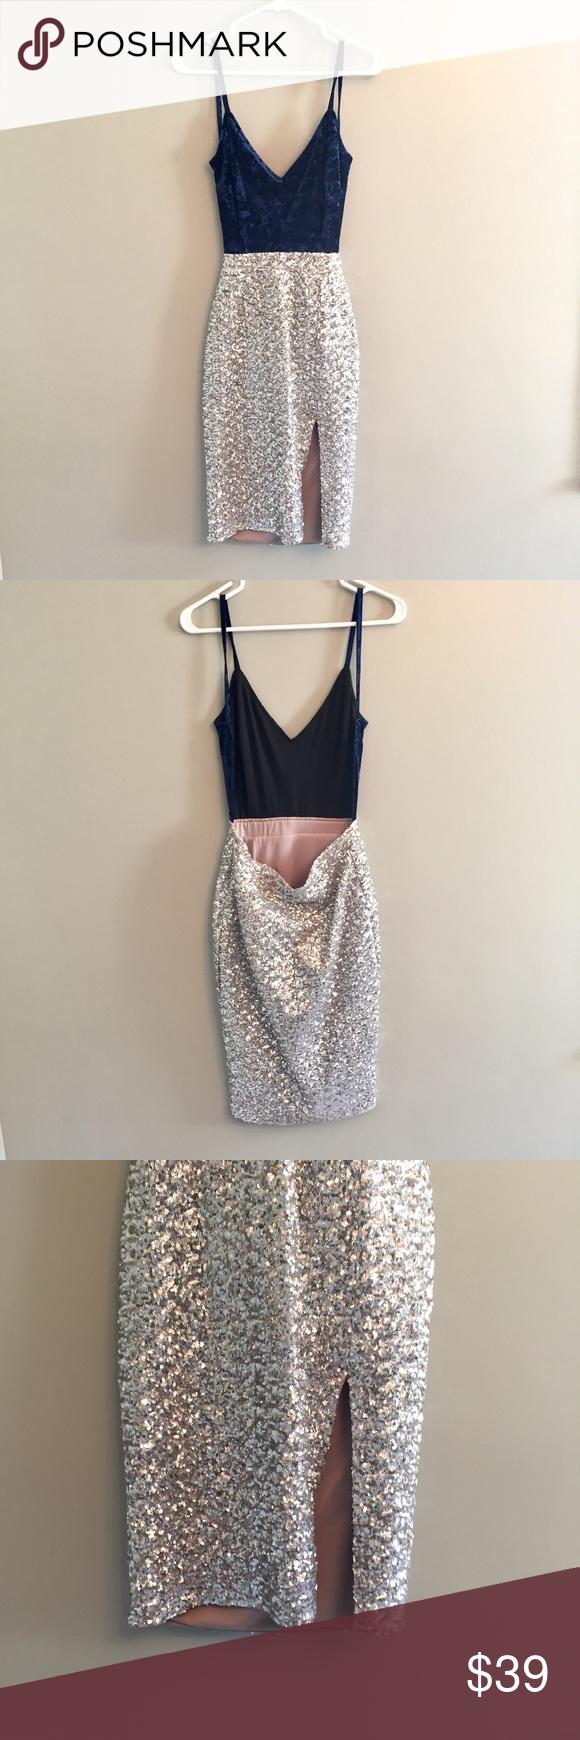 Foreign Exchange Velvet And Sequin Backless Dress I